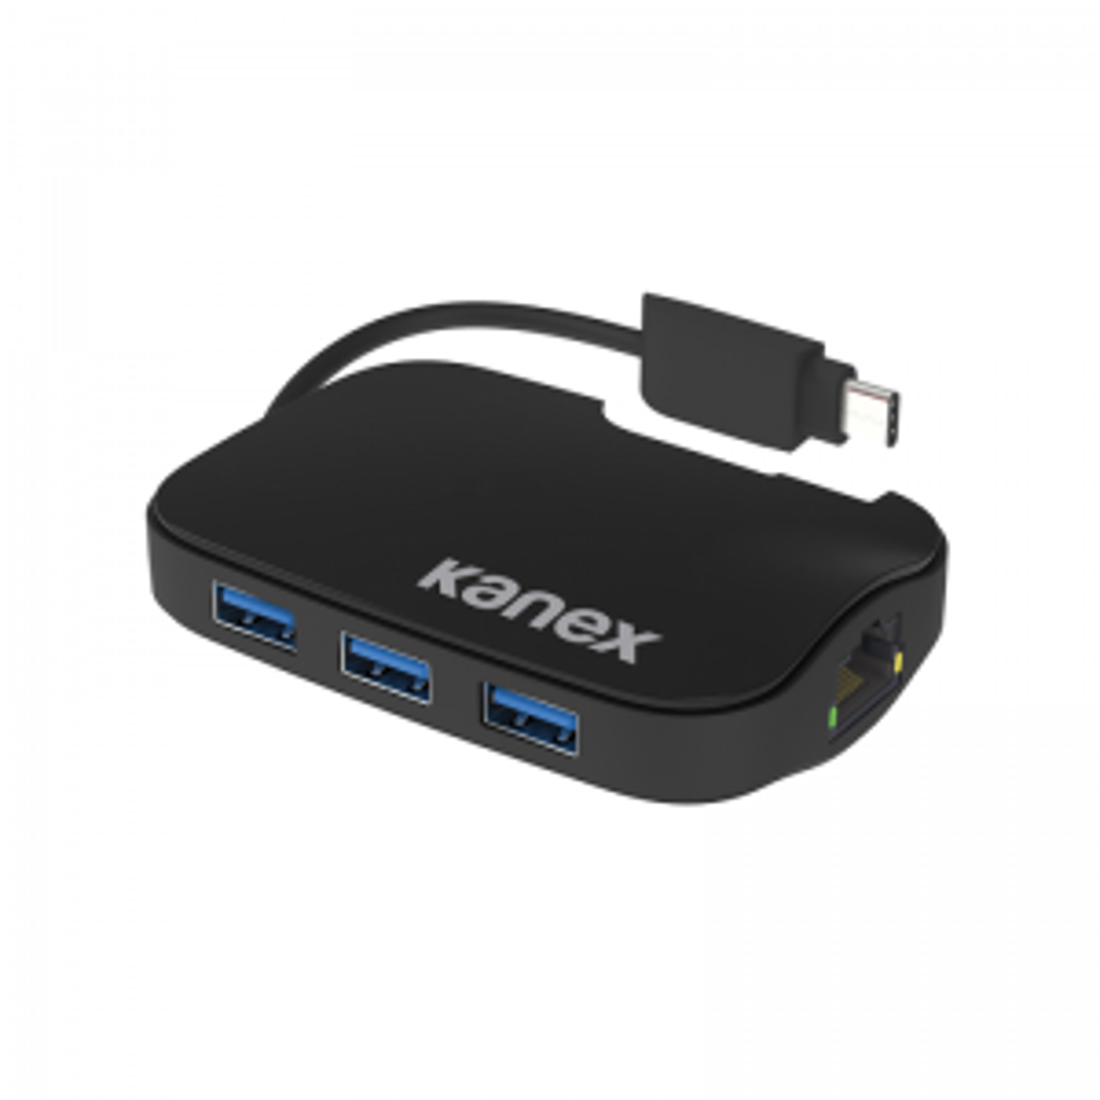 Kanex USB-C 3-port Hub with Gigabit Ethernet